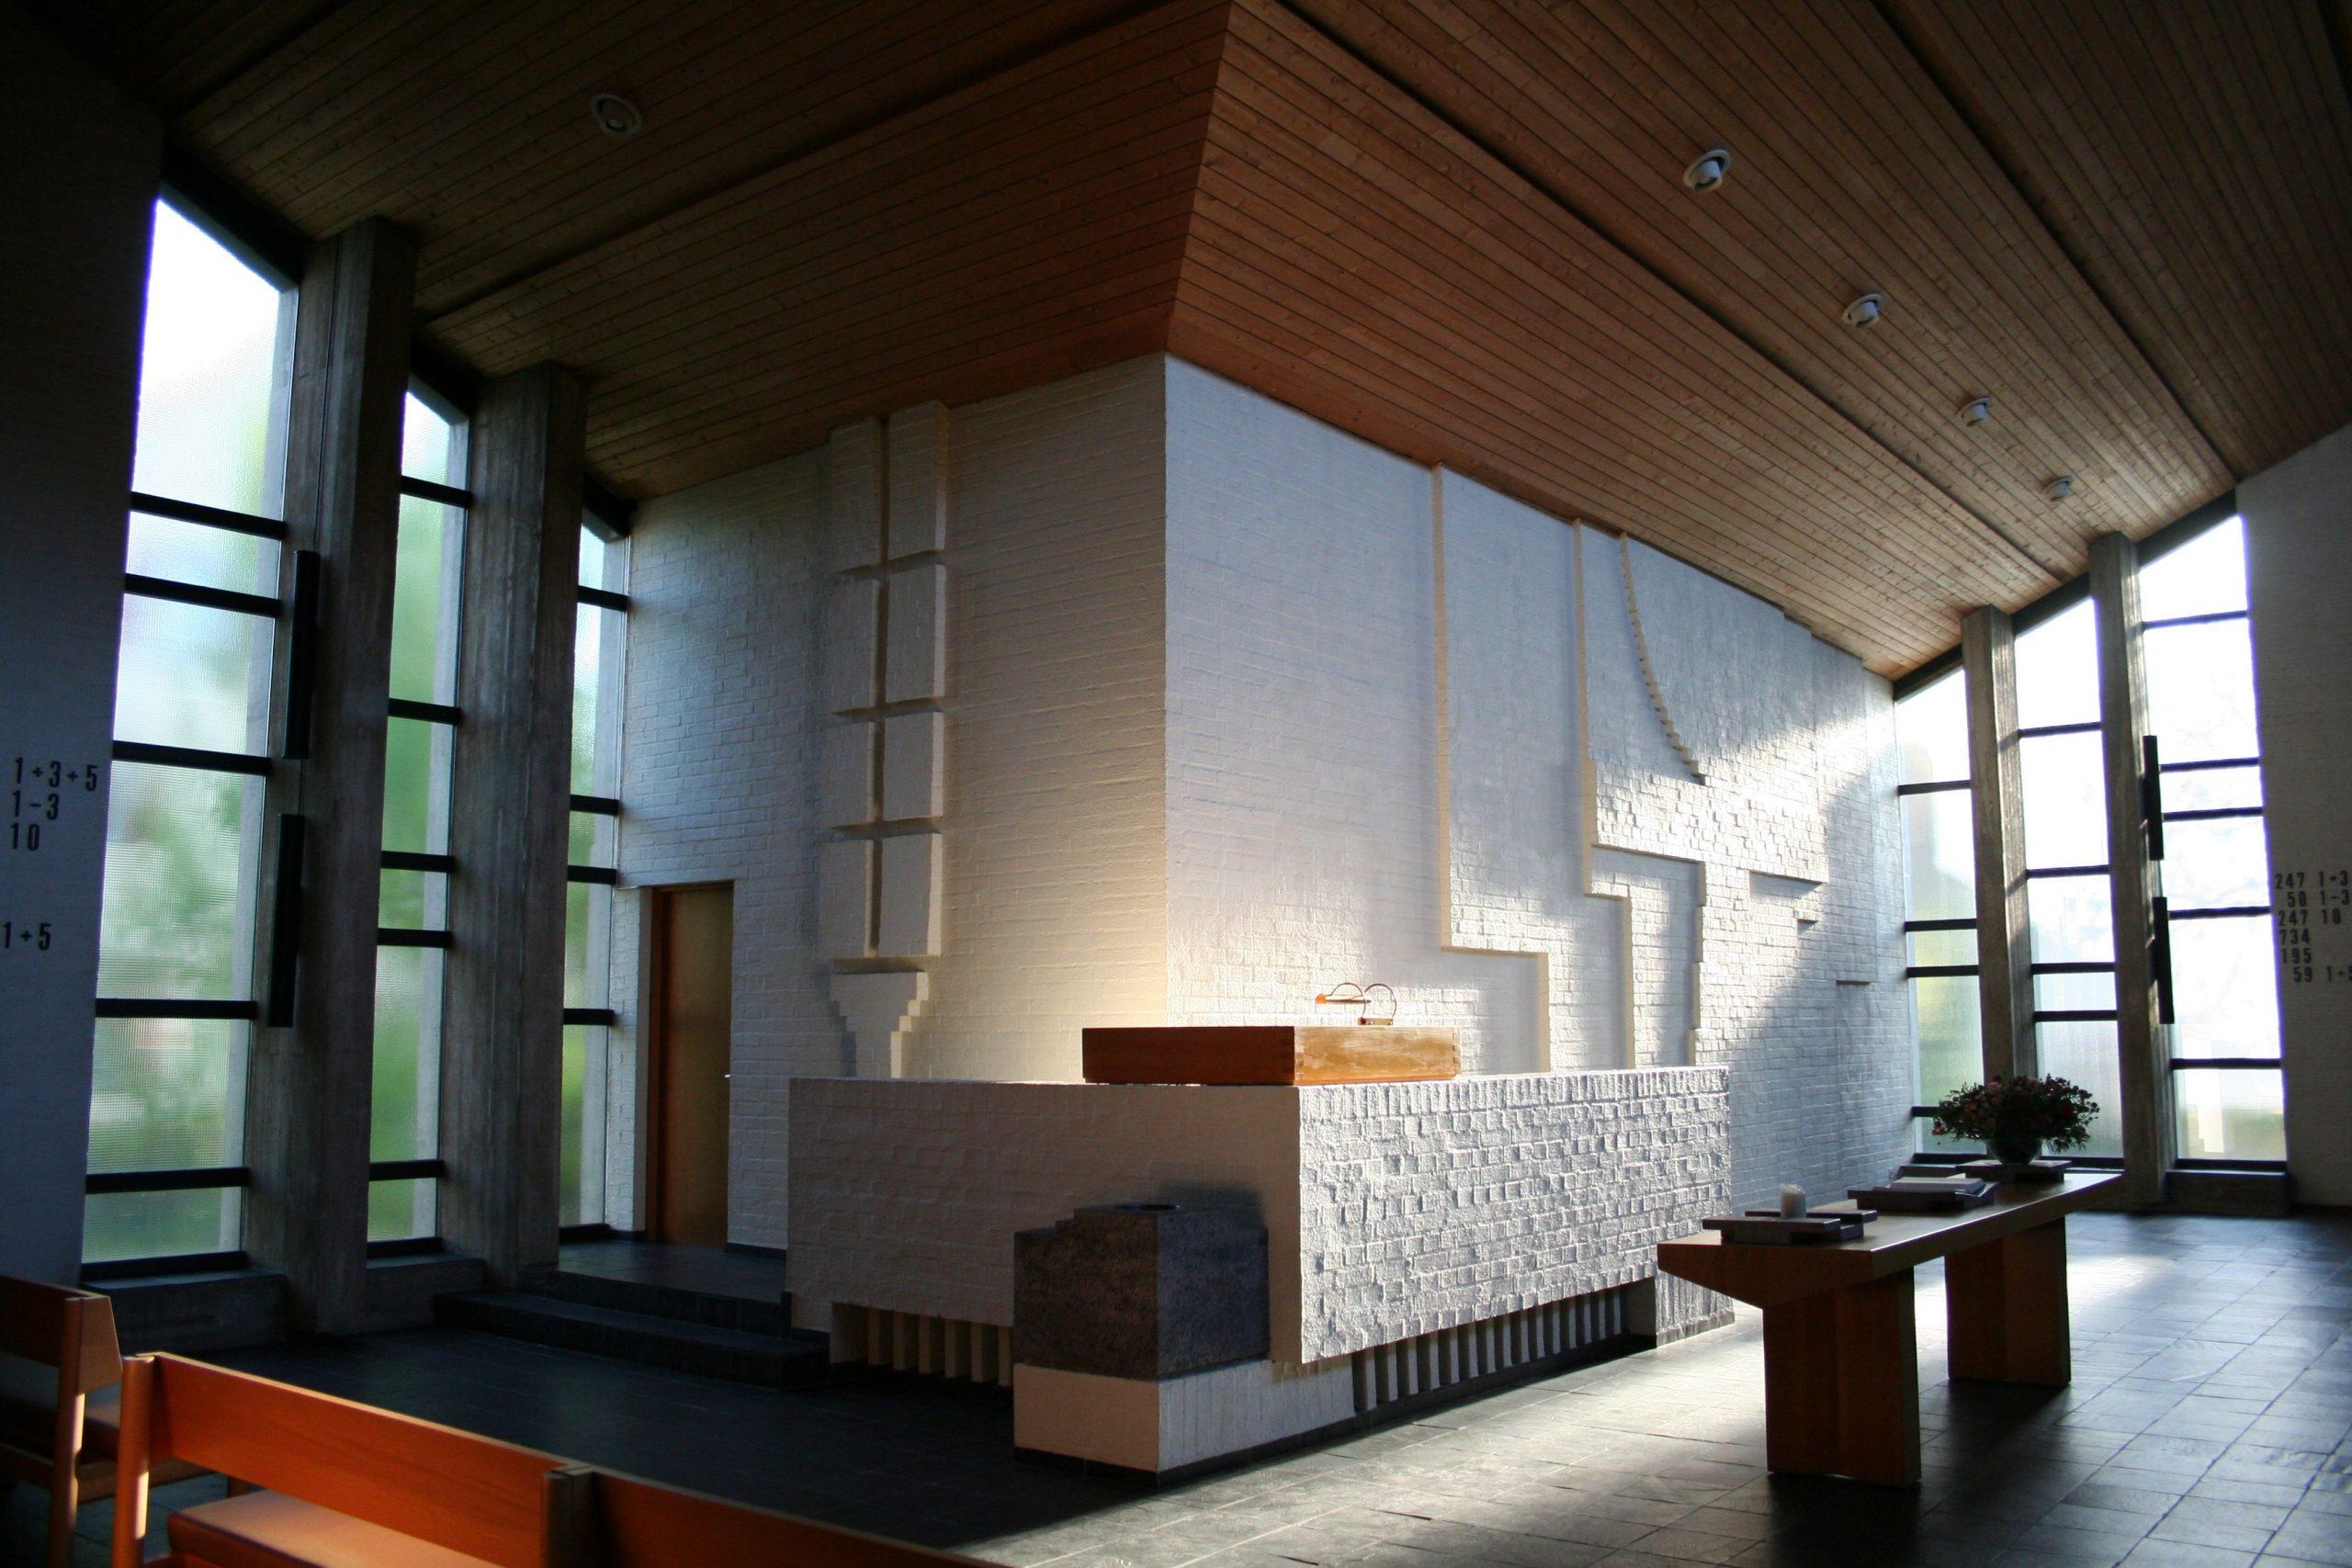 Titus Kirche - Kirchenraum